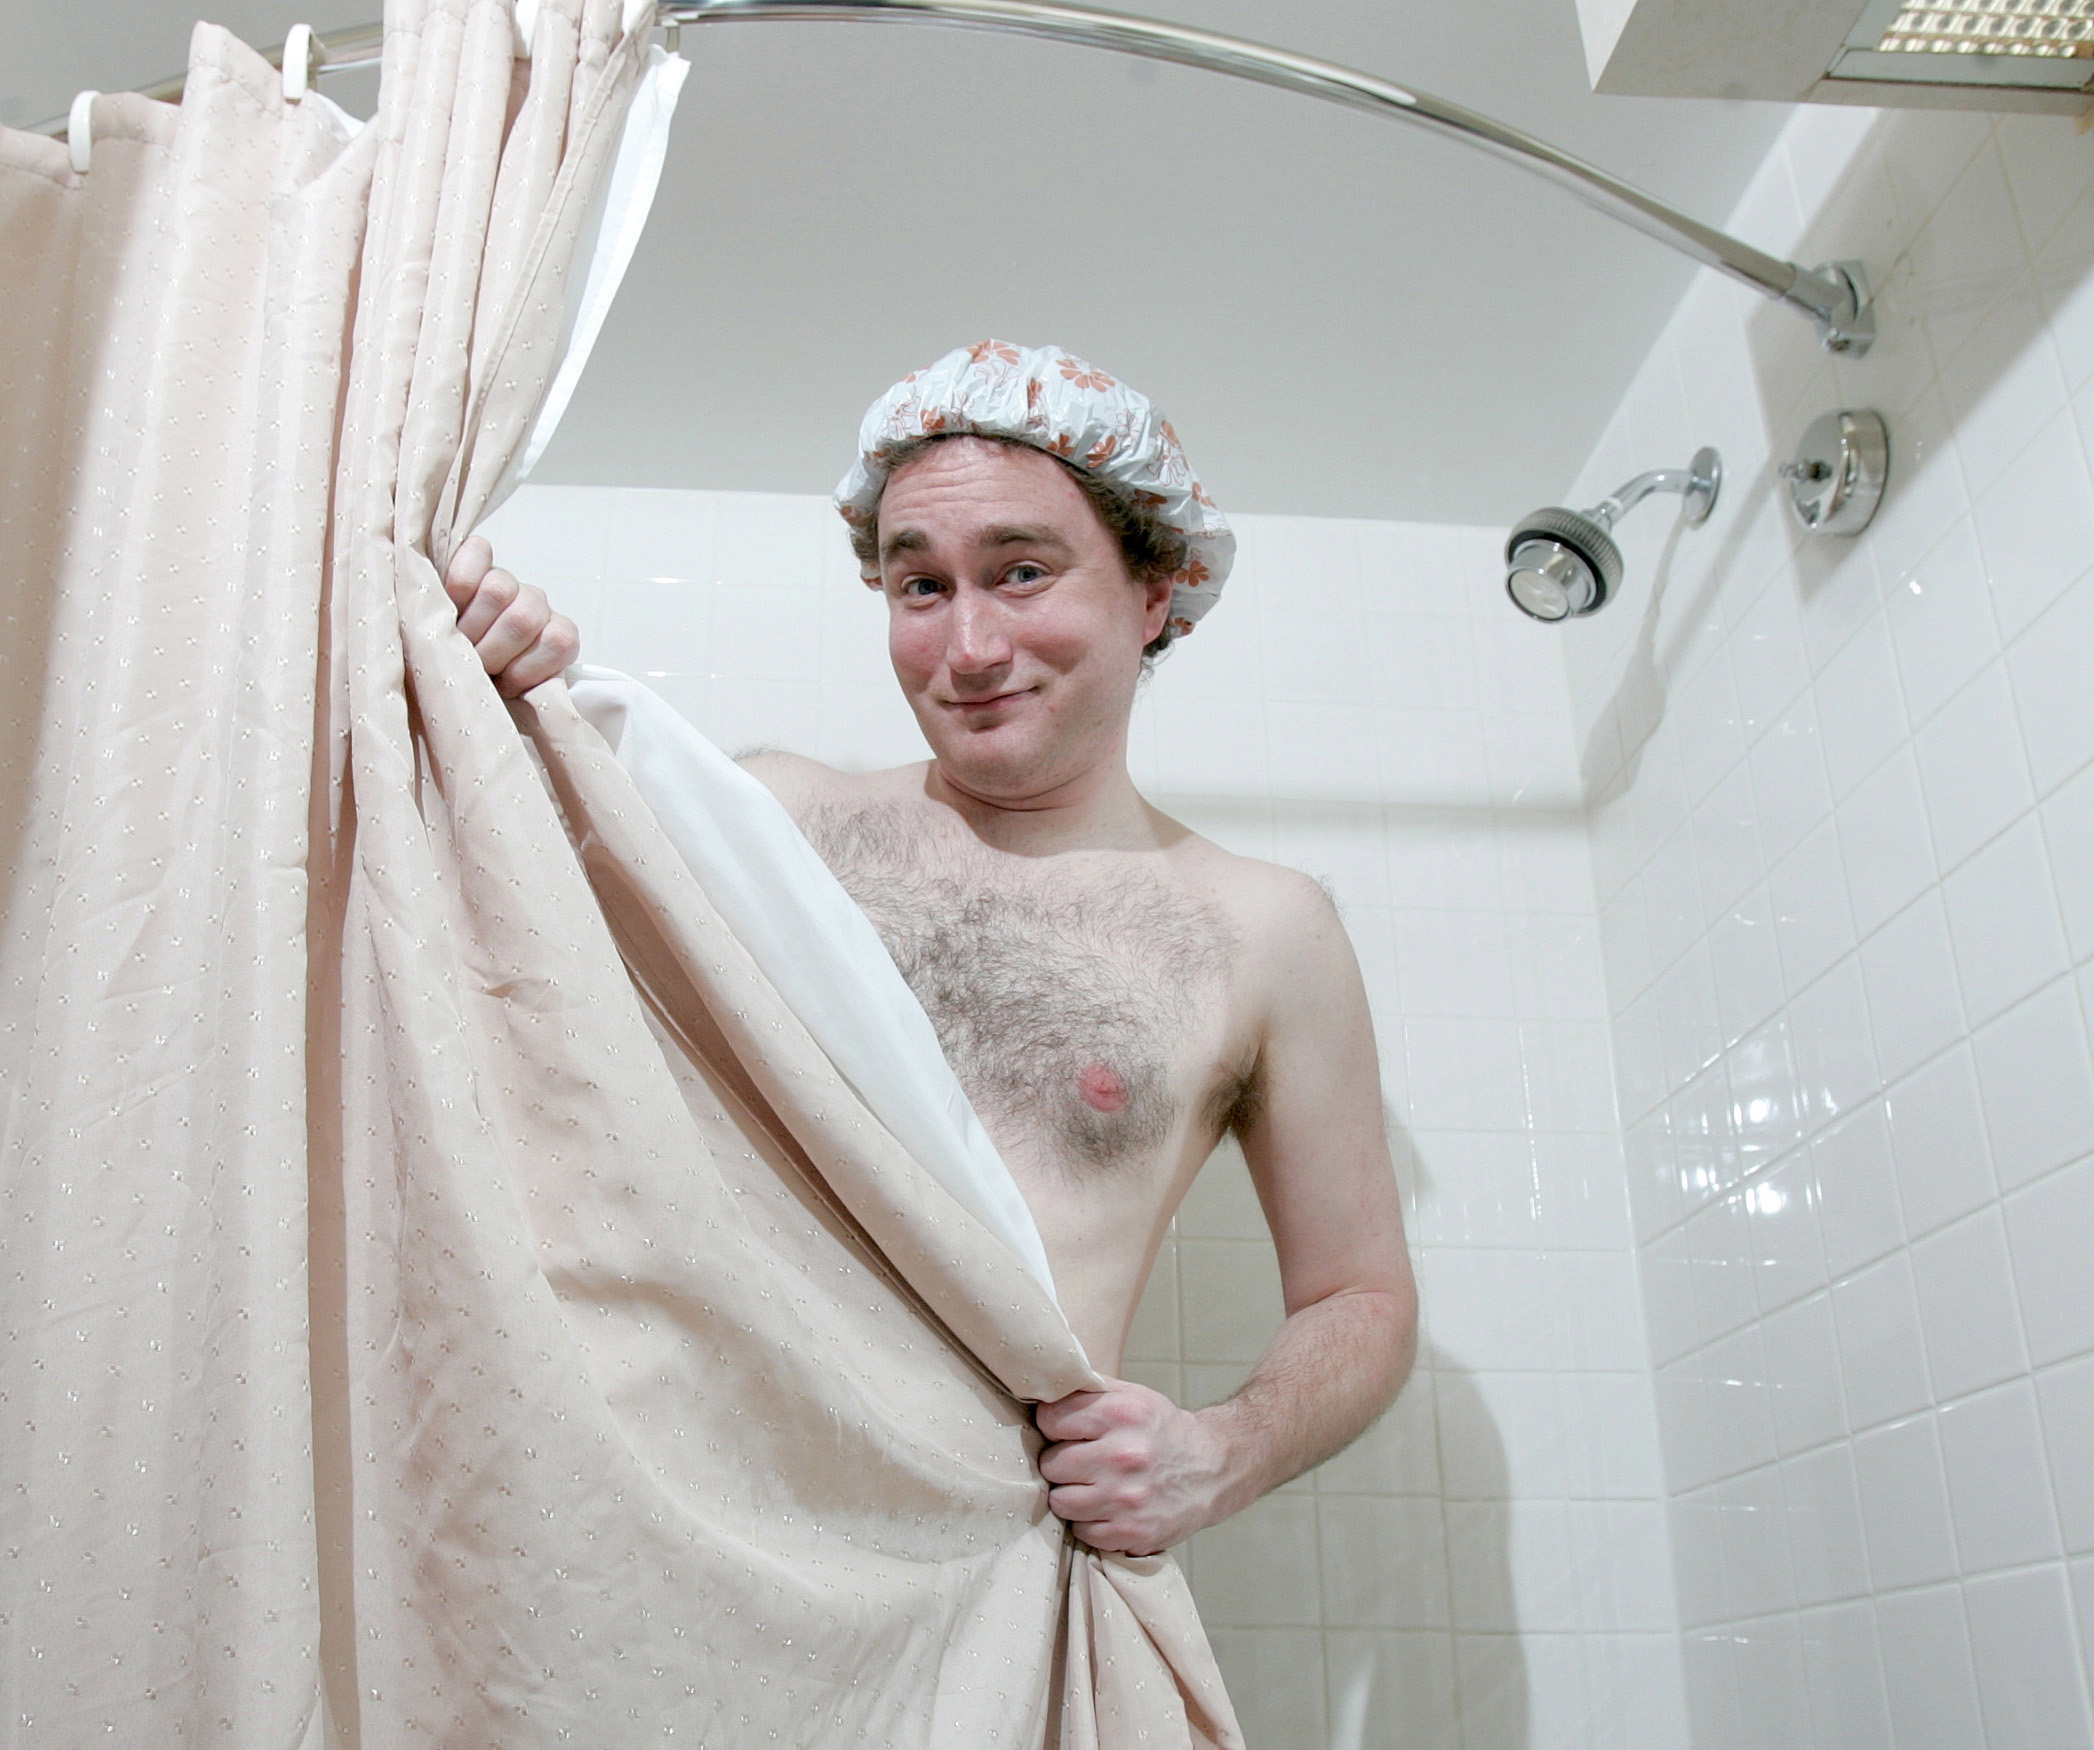 041905 Shower Show-2